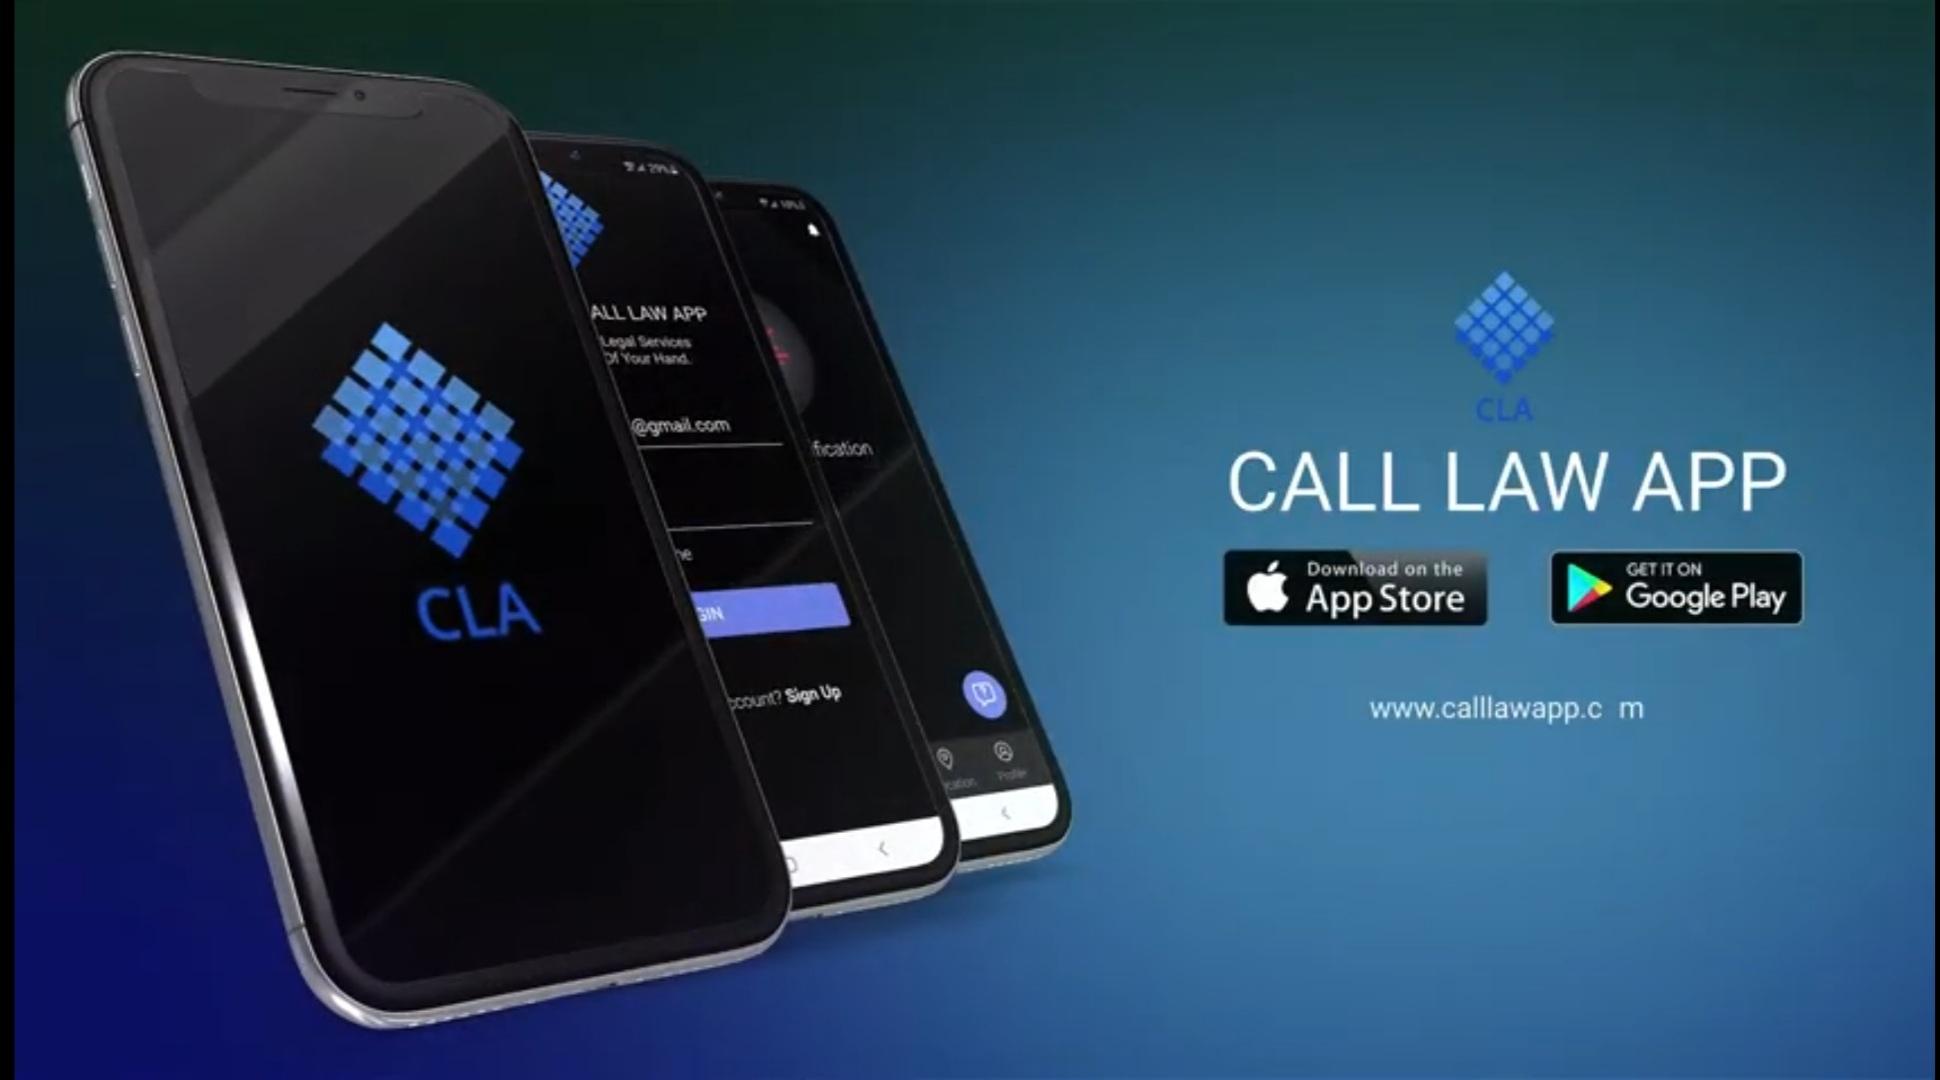 CALL LAW APP Screenshot_20210311-105940_YouTube-1 Home Before